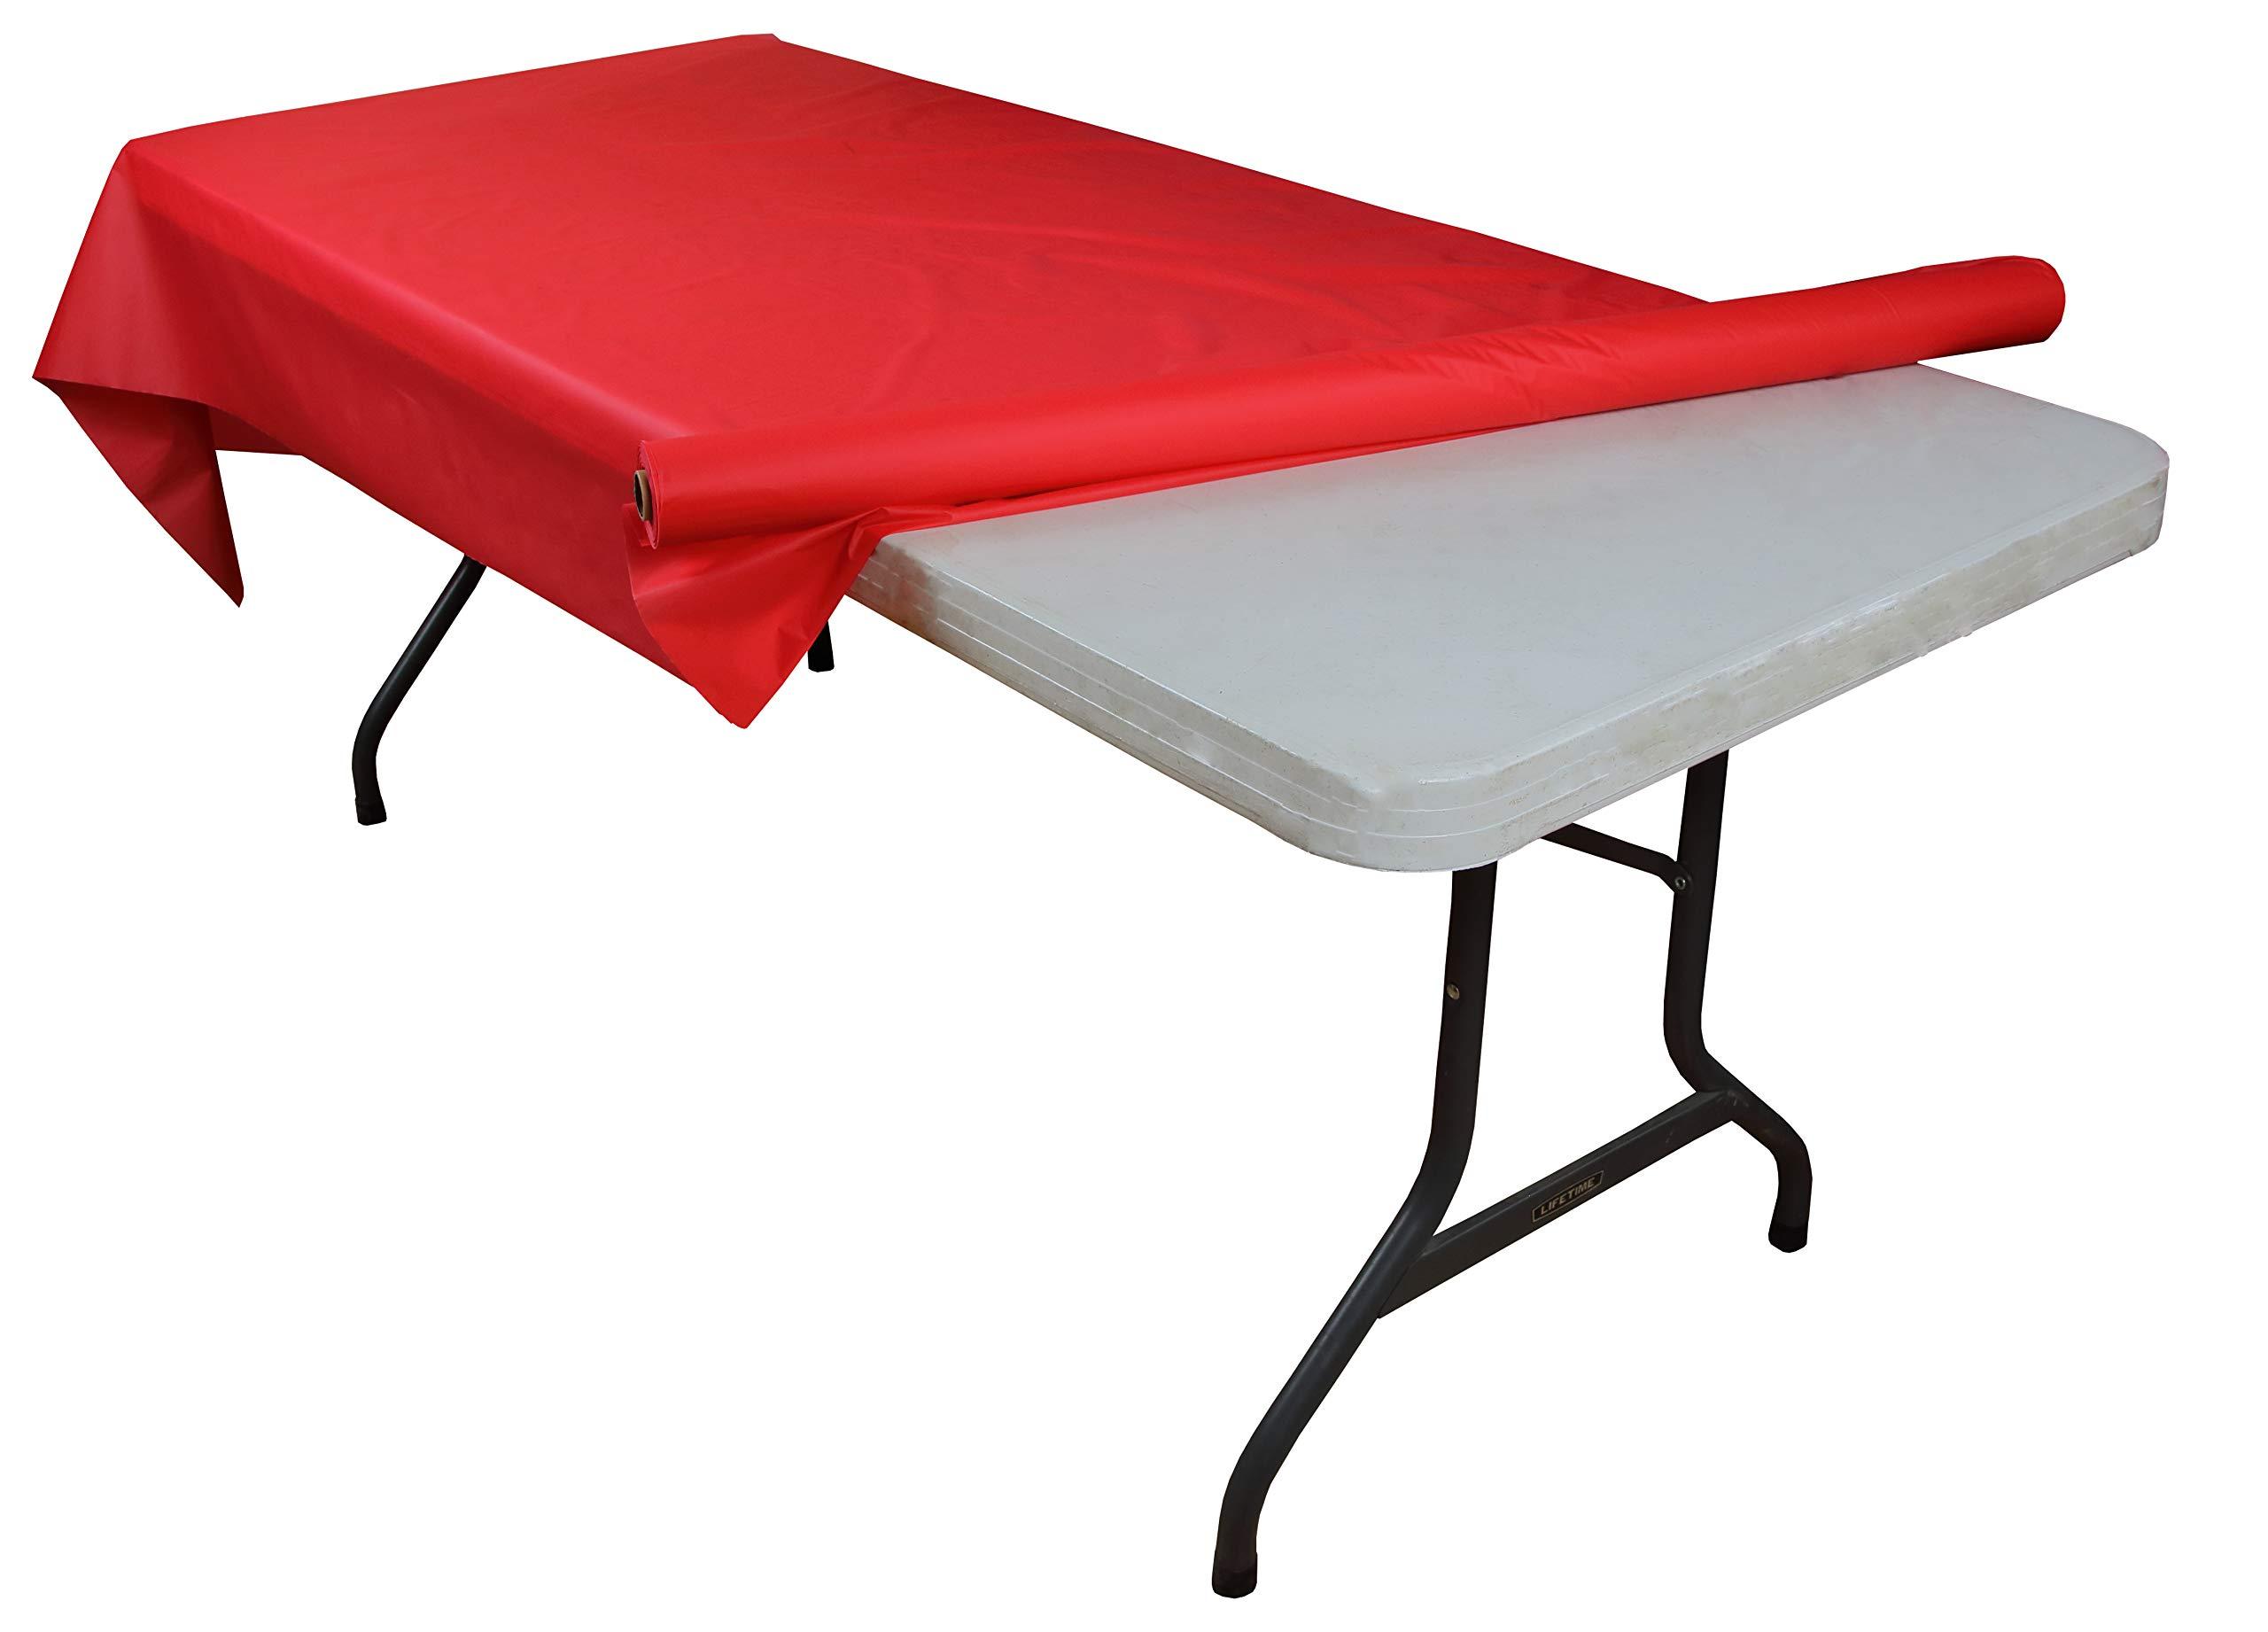 Exquisite Premium Quality Plastic Table Cover Banquet Rolls 40'' X 300' (Red)